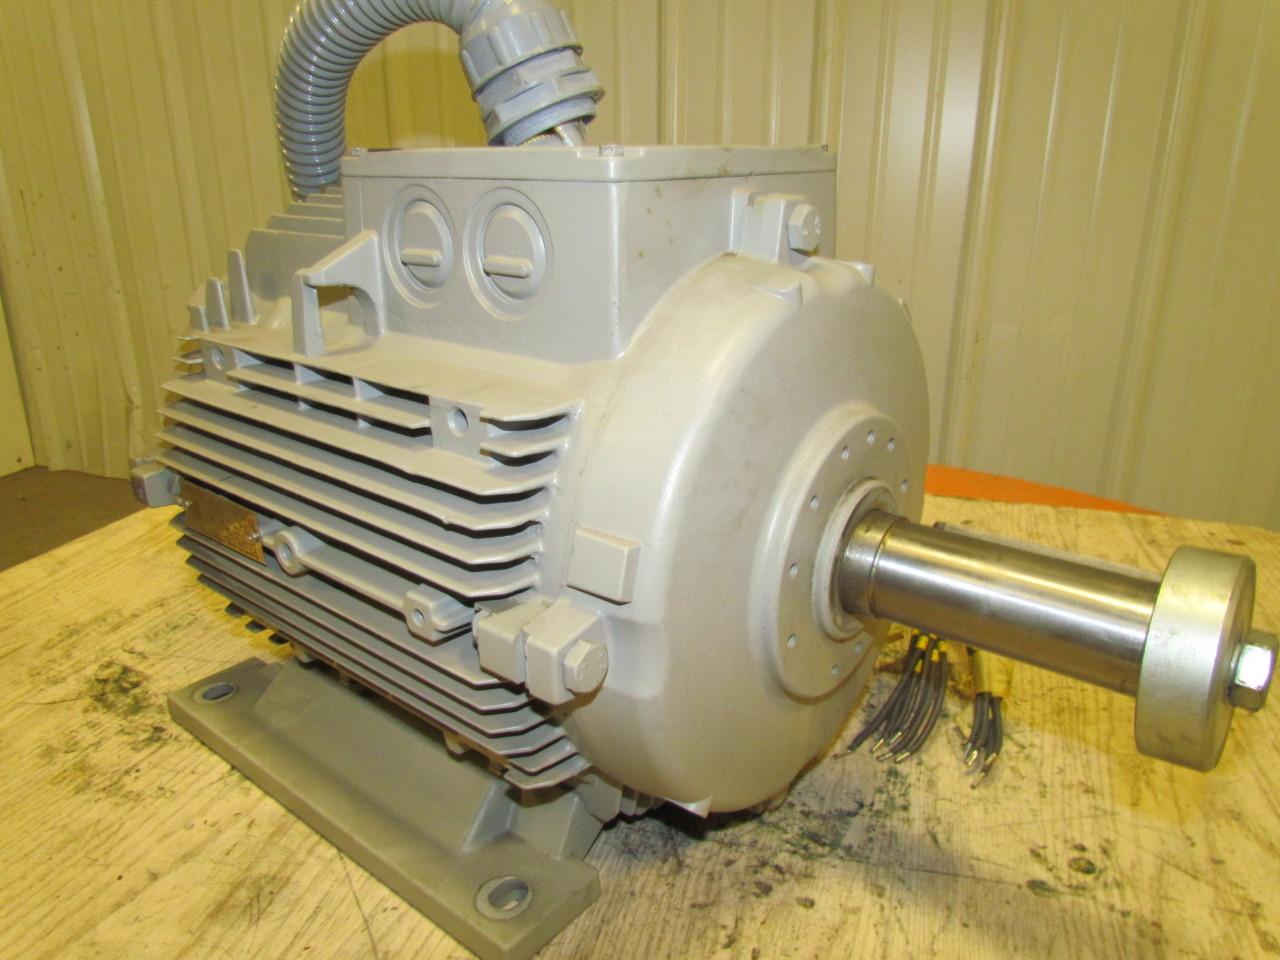 Siemens 1 la7169 2ba90 zt06 el ctrica ac motor 20 hp 15 kw for Electric motor 20 hp